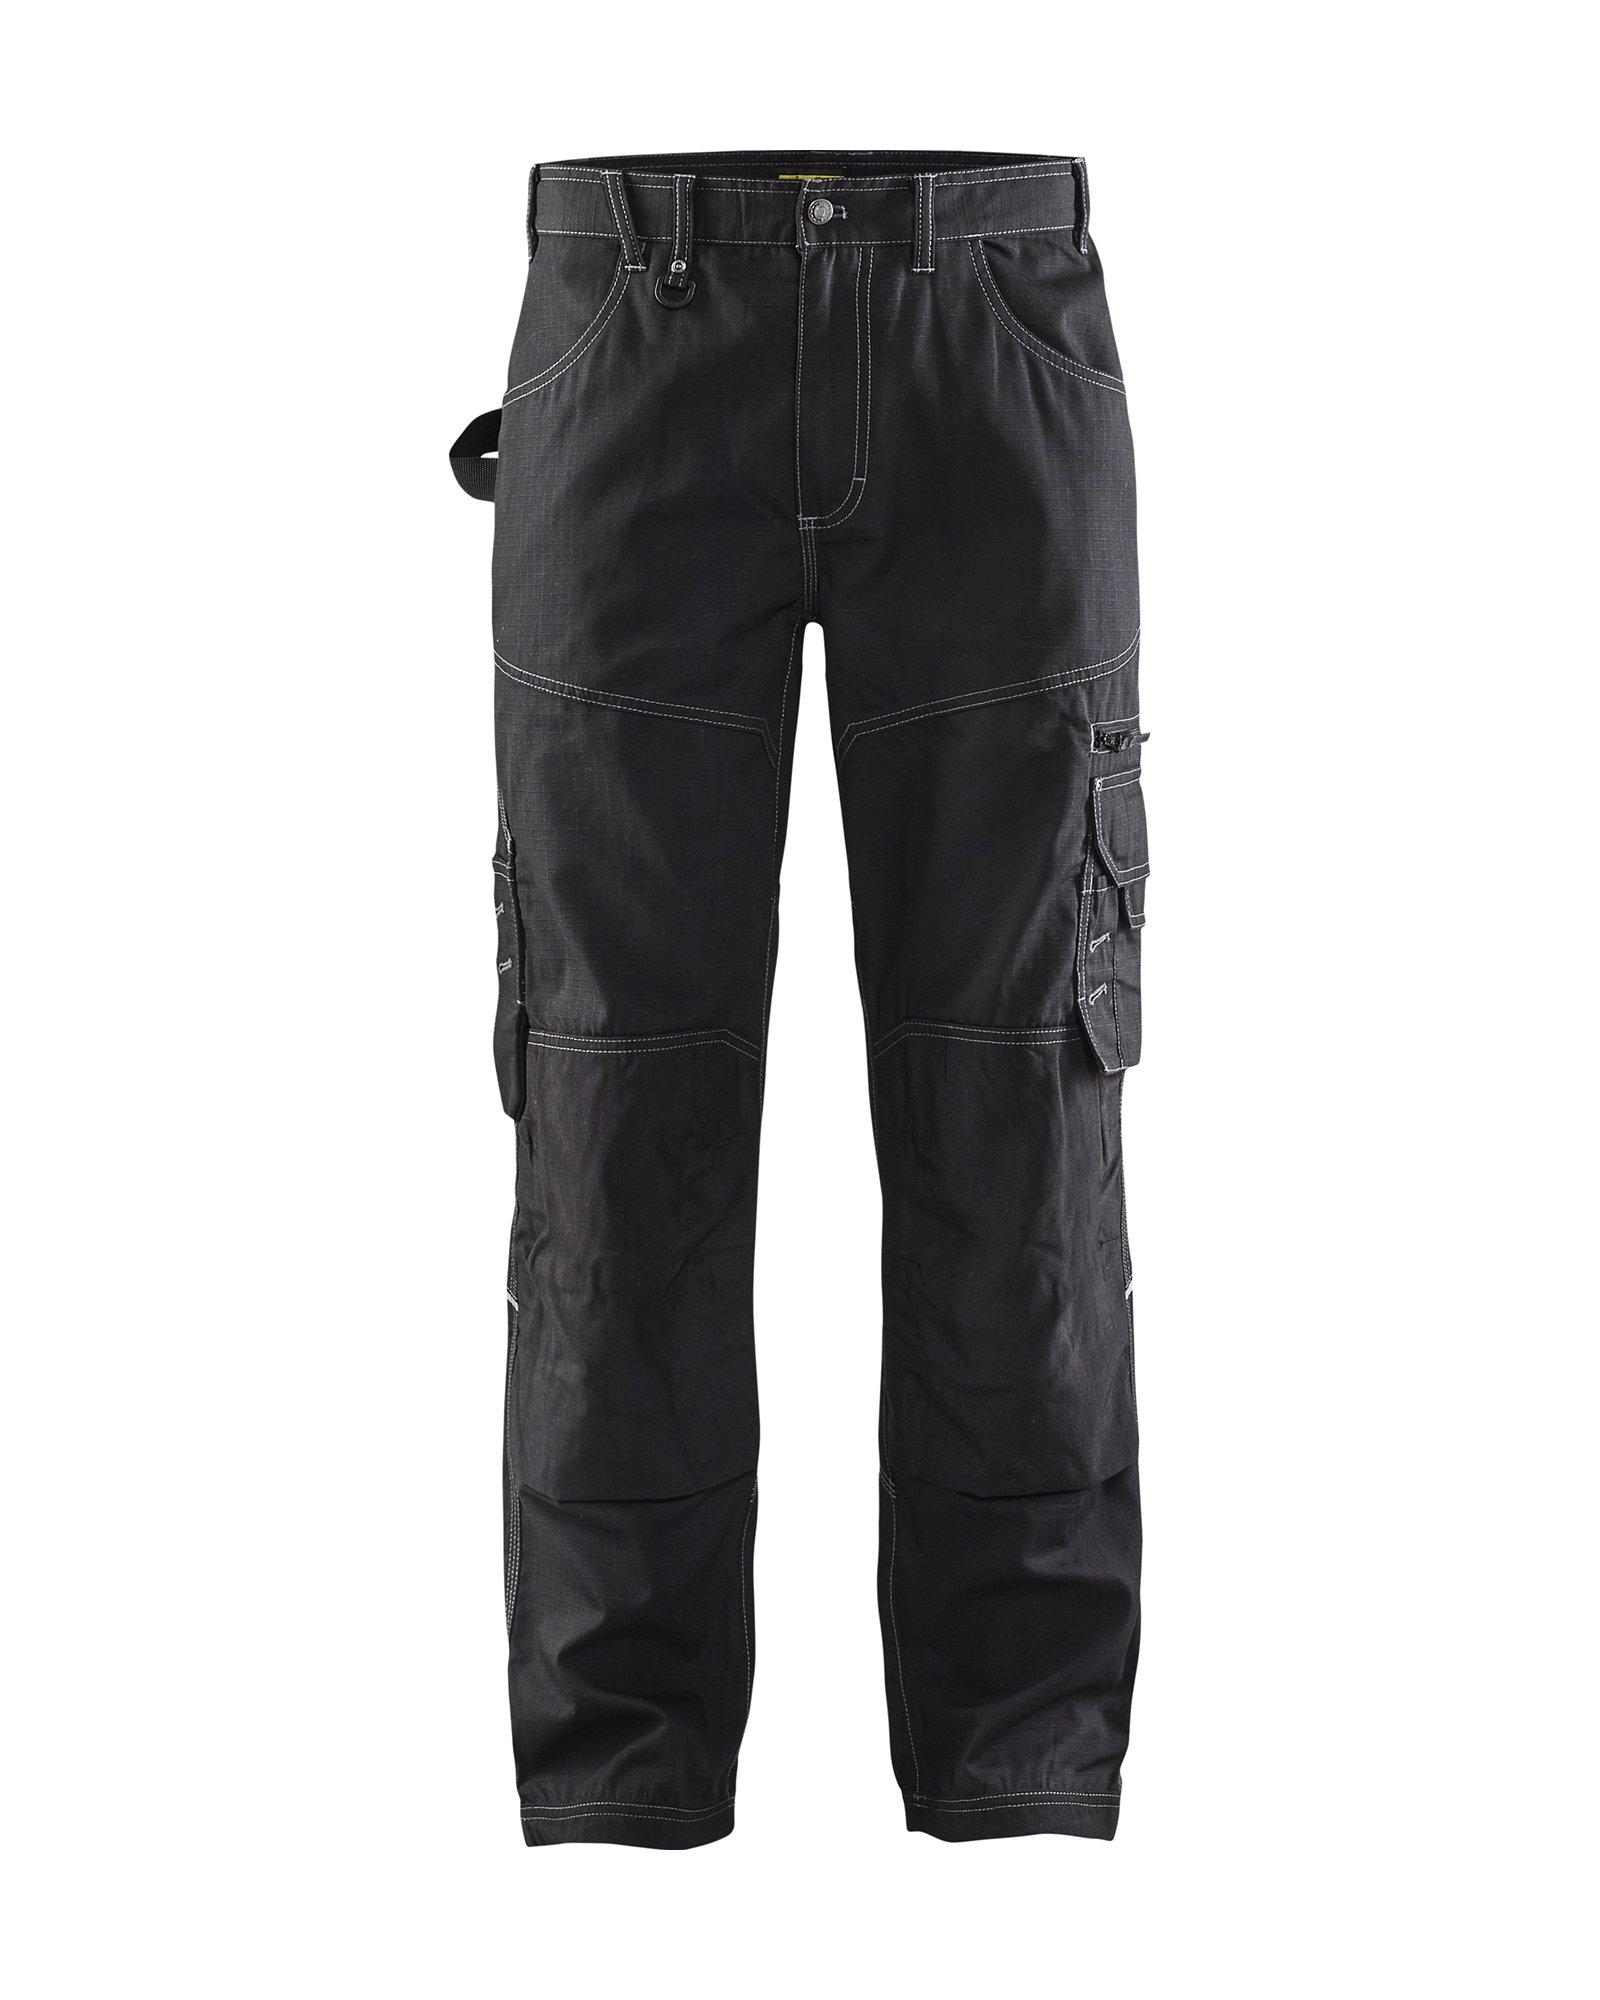 Blaklader Ripstop Pants Black 32 32 by Blaklader (Image #1)